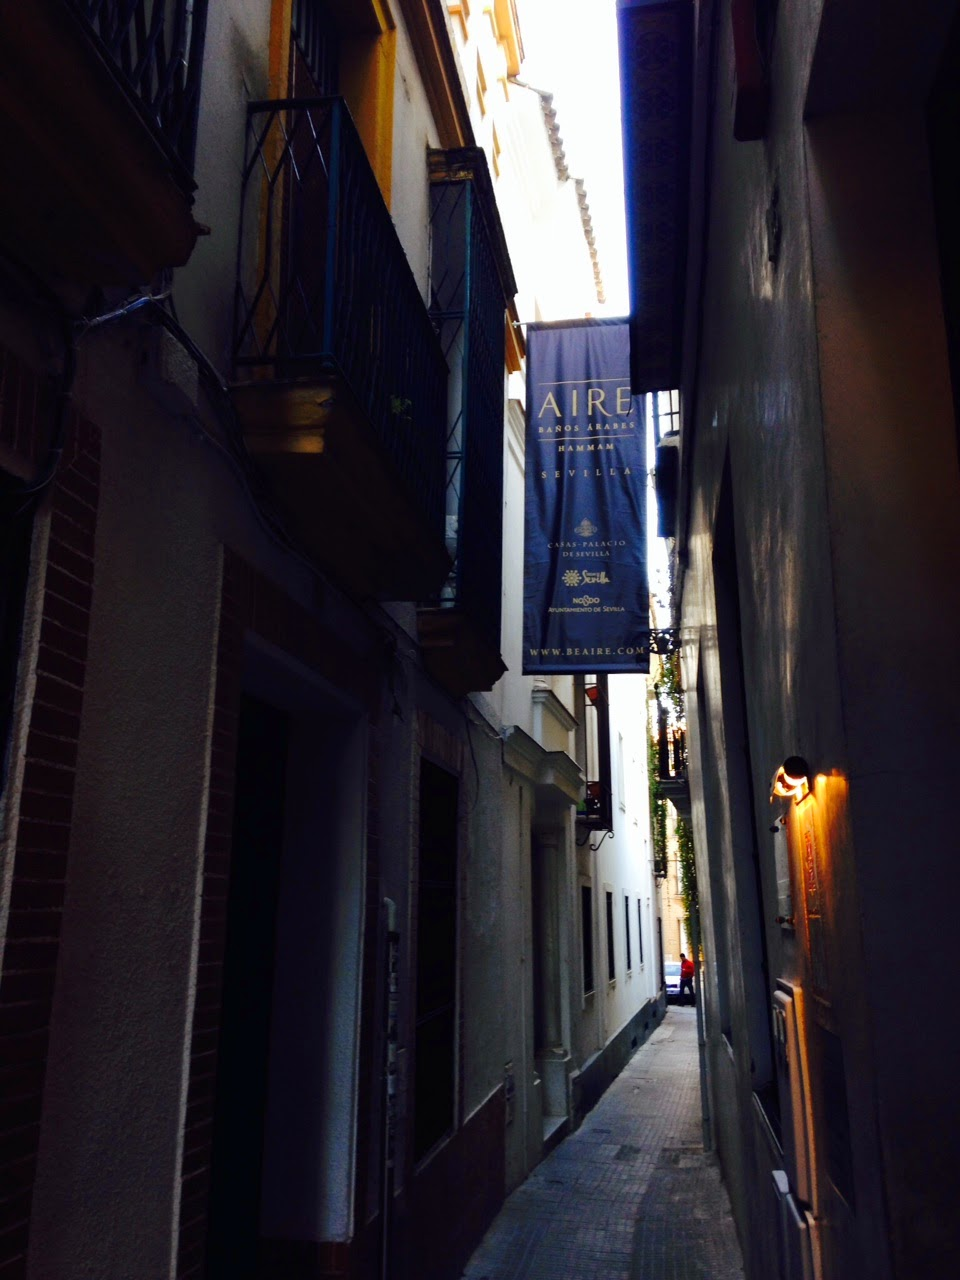 Ba os rabes aire de sevilla a la ultima life style tratamientos thecoolplan - Banos arabes sevilla 2x1 ...